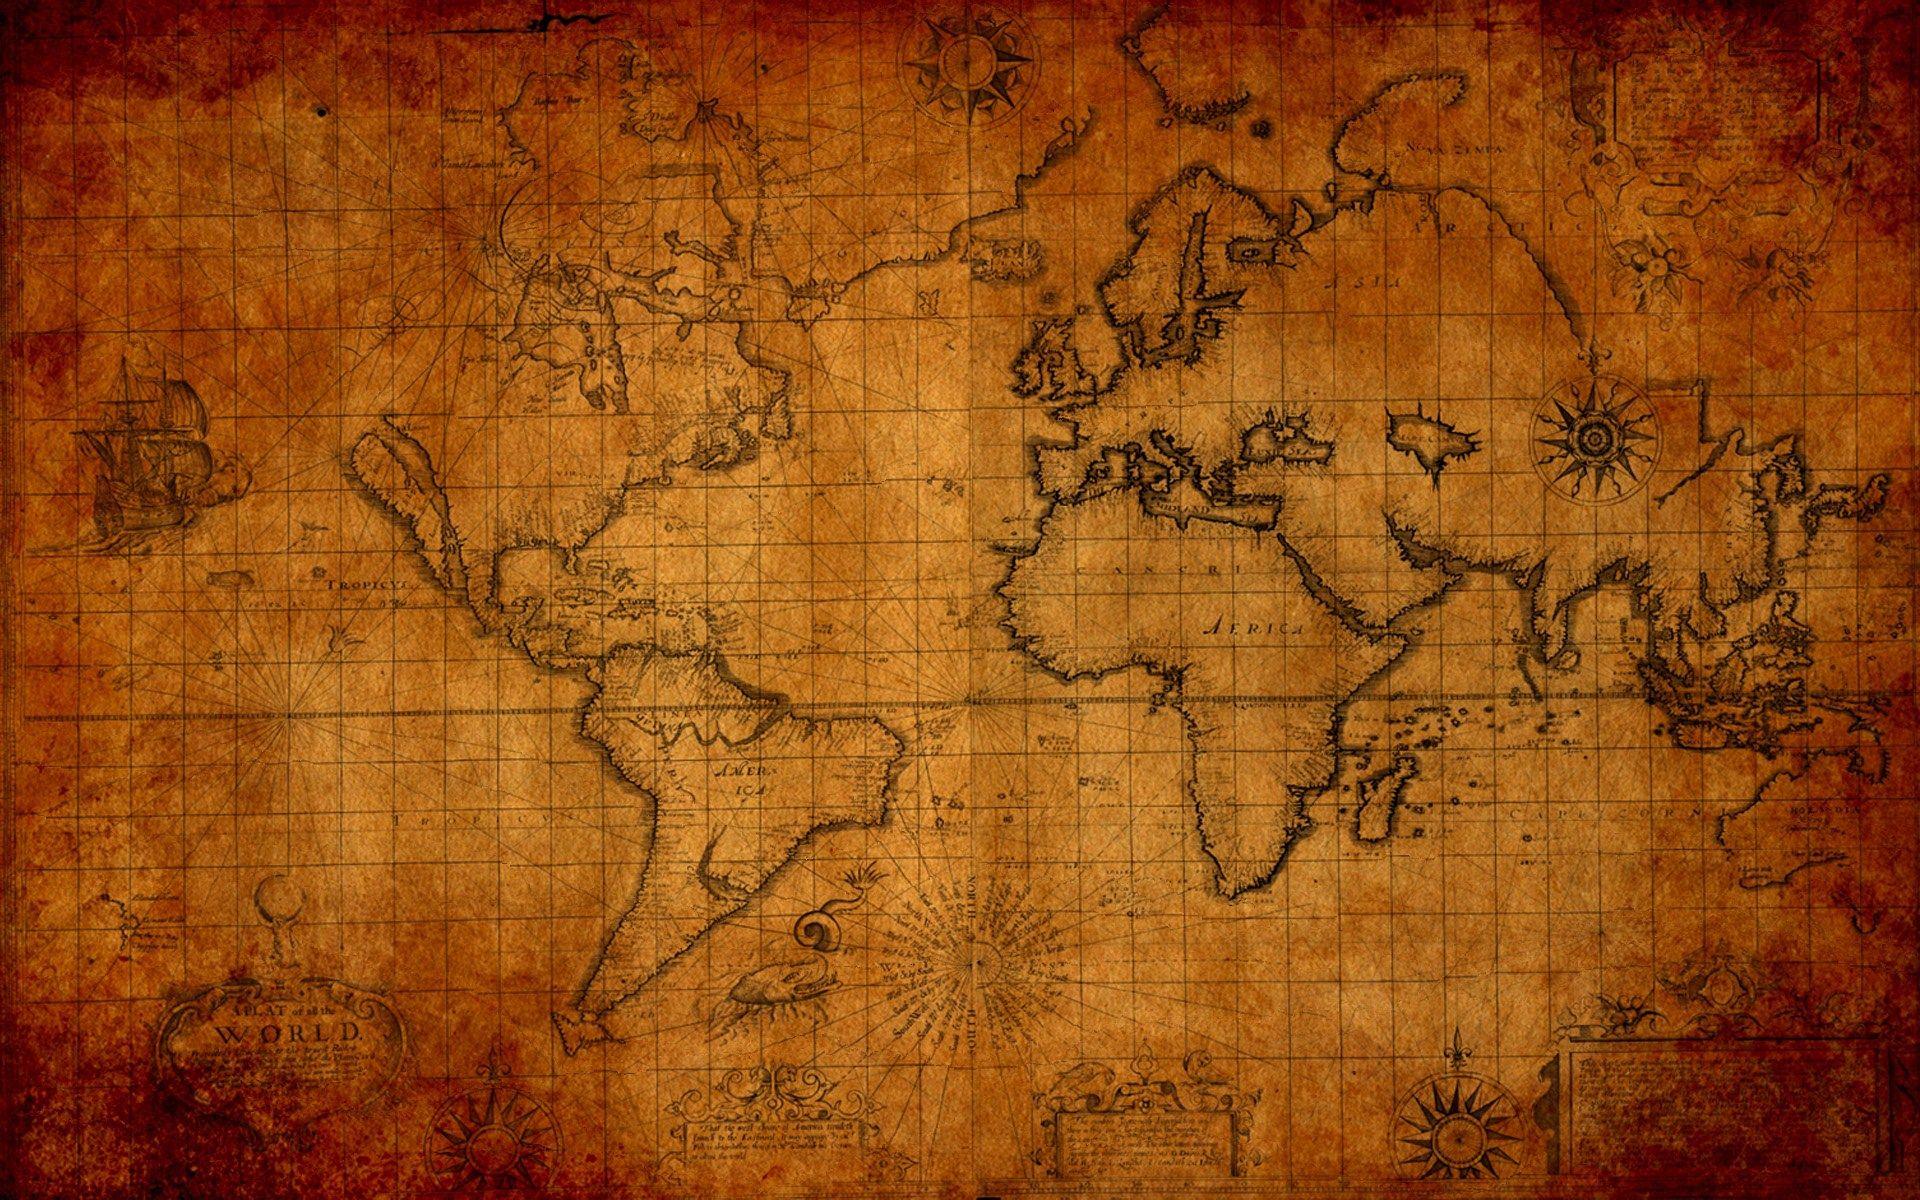 map wallpaper Old World Map Desktop Wallpaper for office back 1920x1200